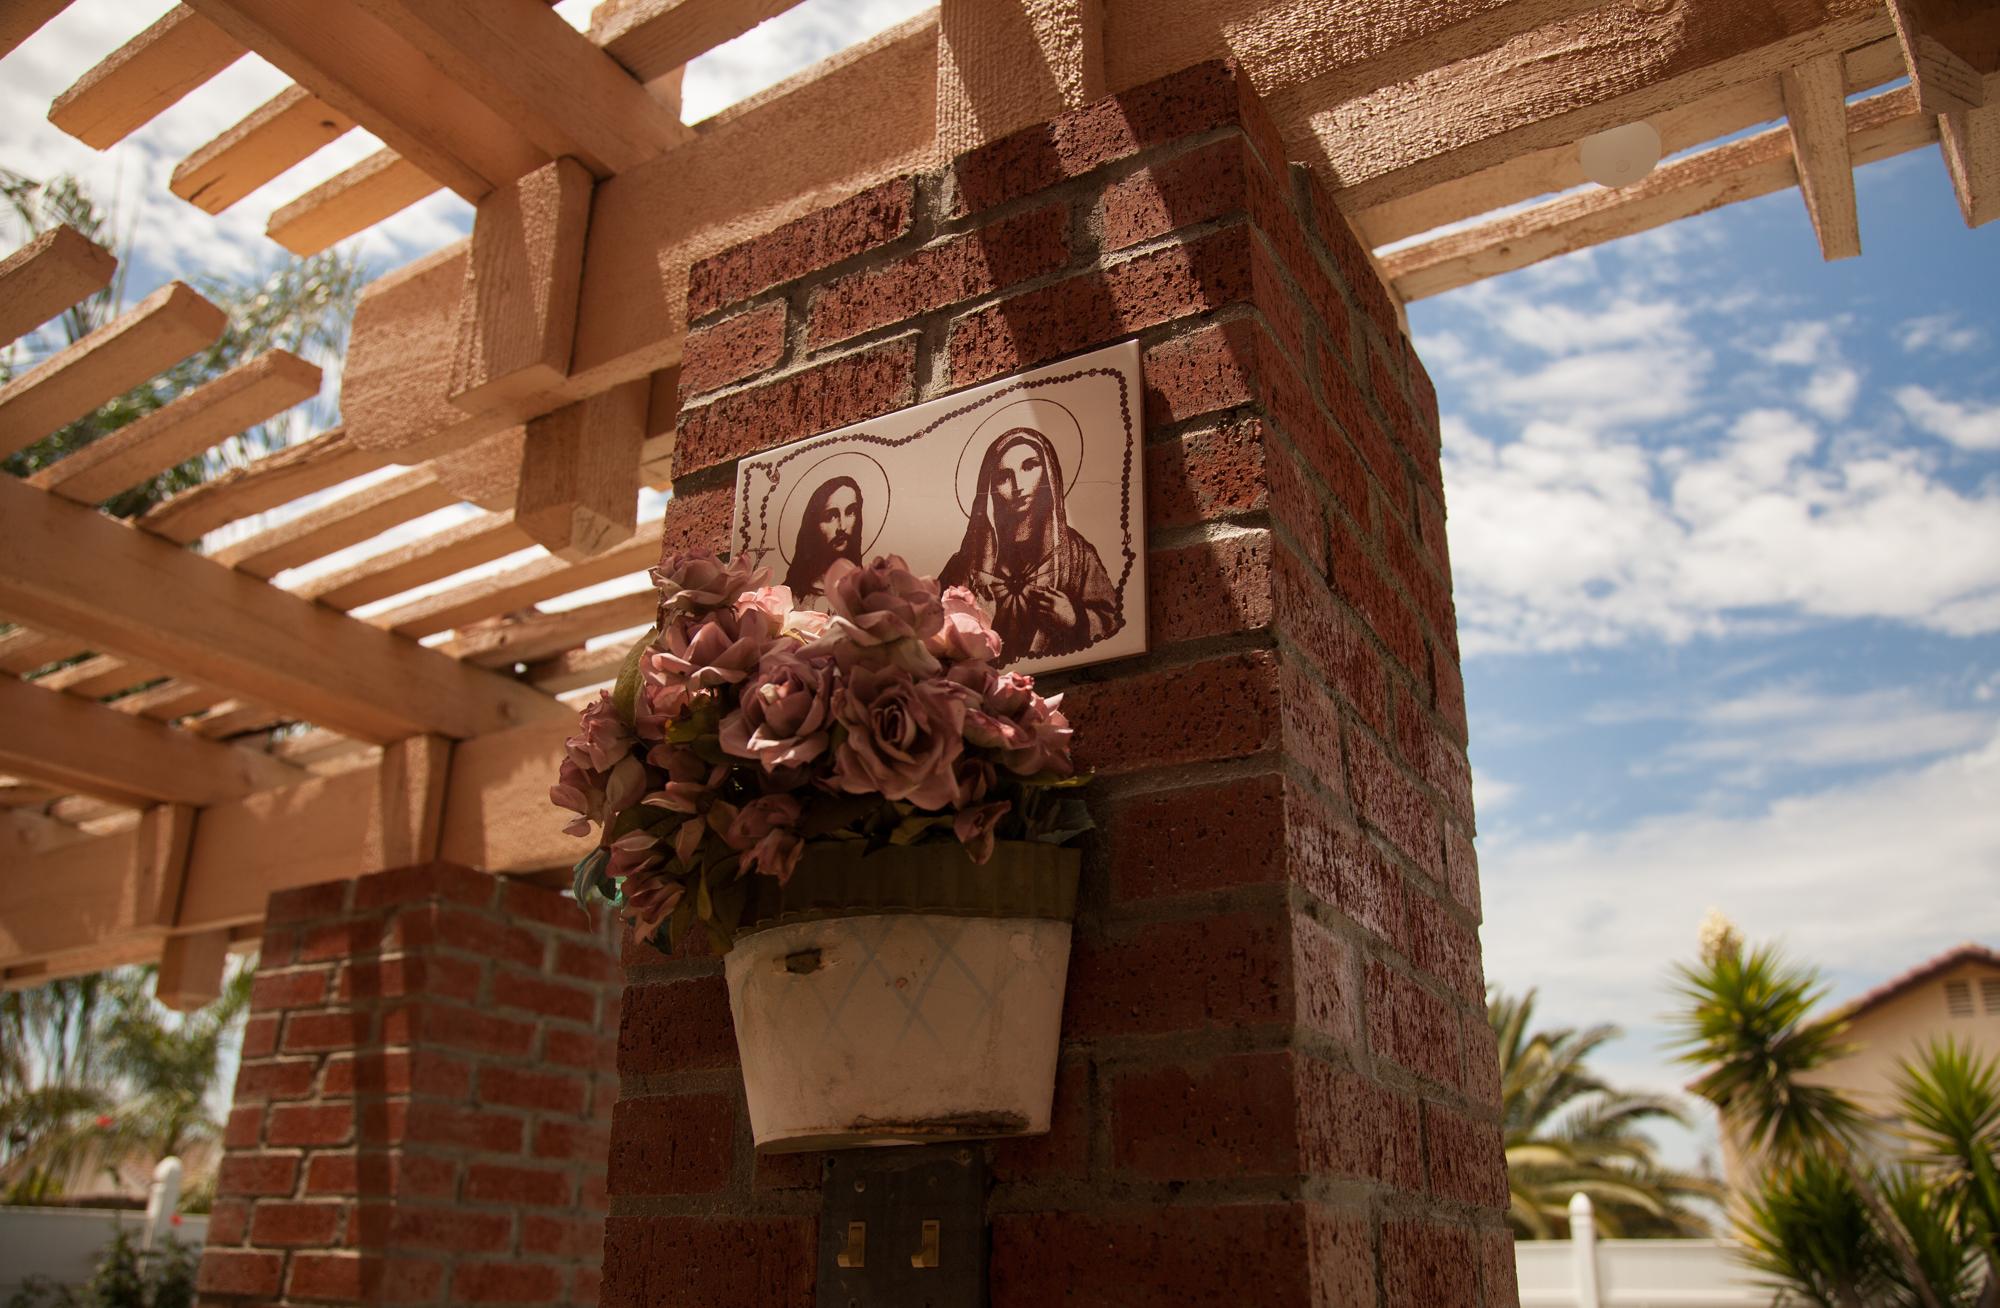 An exterior image of Manolo Guerra's house in Moreno Valley, California, Wednesday, Aug. 7, 2019. (Photo/ Kat Kaye)